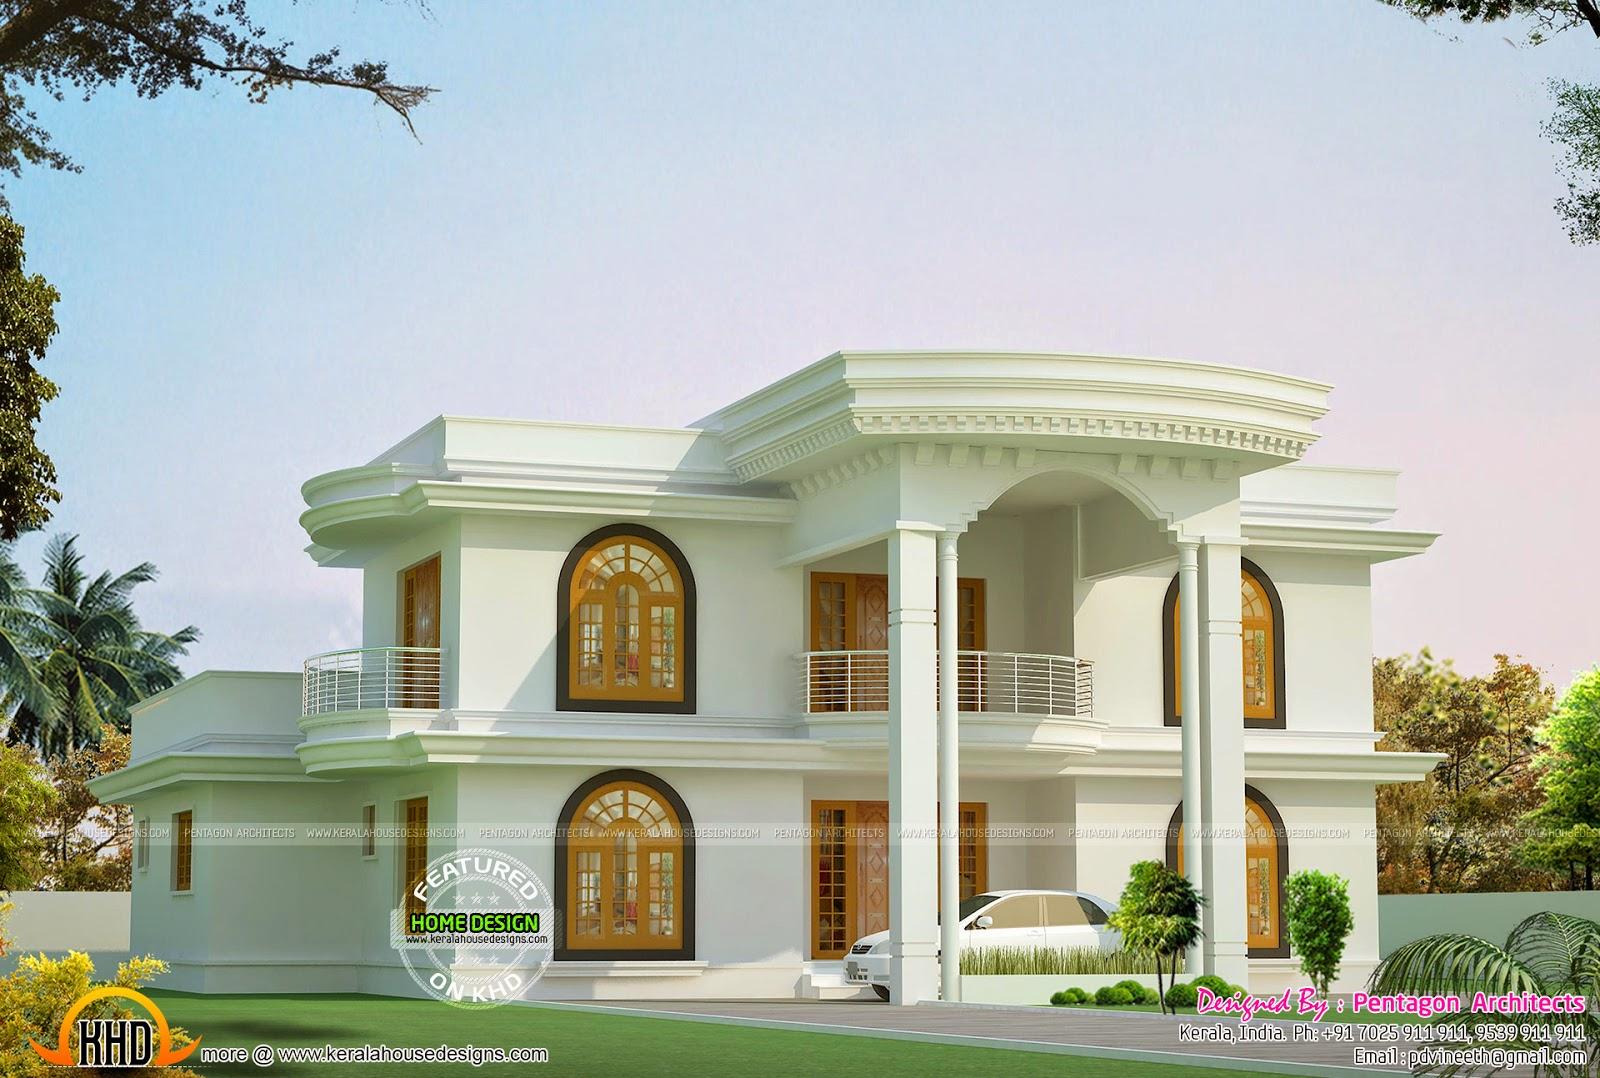 Kerala house plans set part 2 - Kerala home design and ...